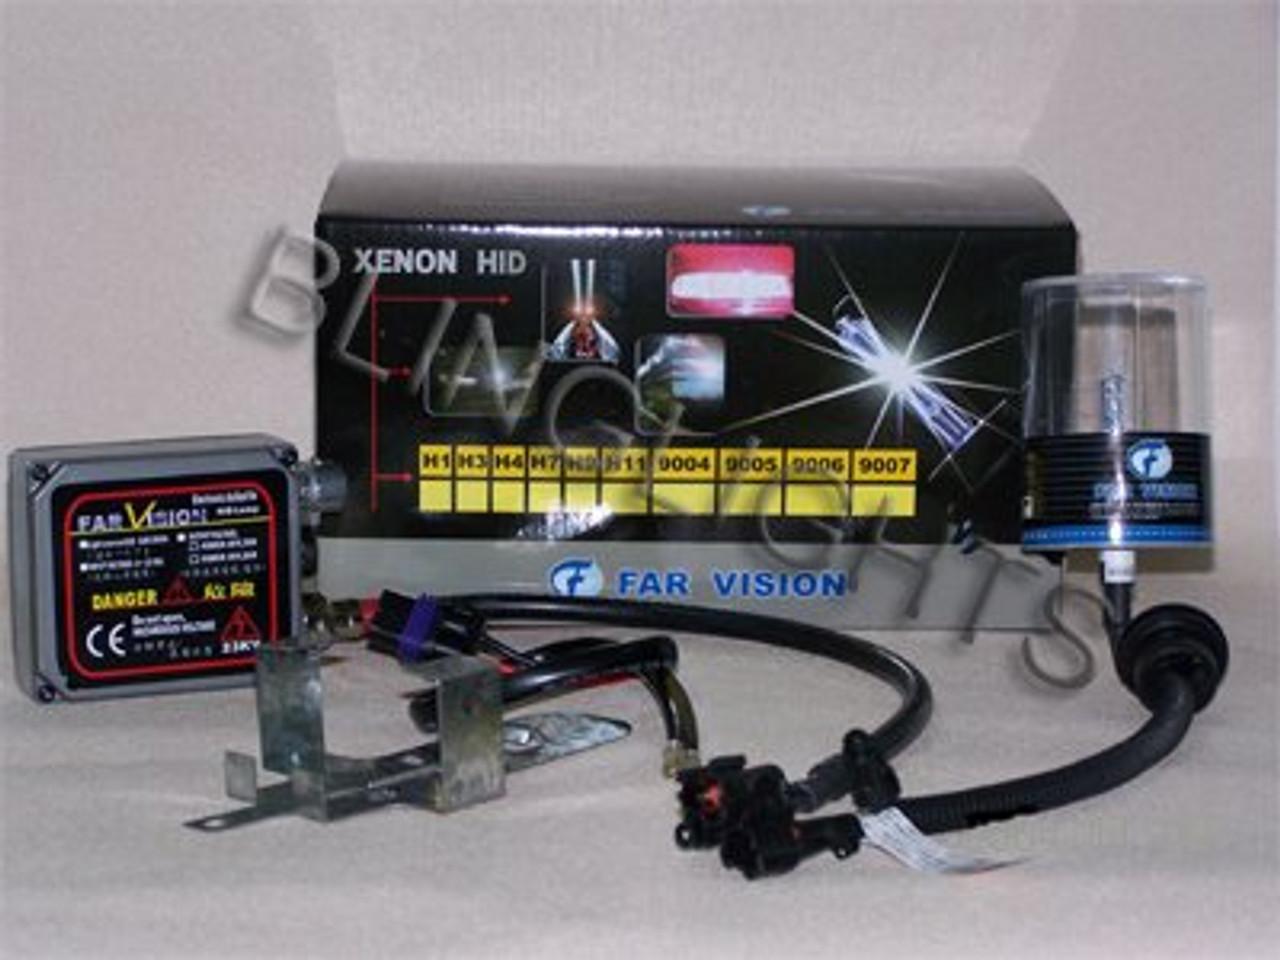 2002 2003 2004 2005 Dodge Ram Xenon HID Conversion Kit Headlamps Headlights Head Lamps Lights